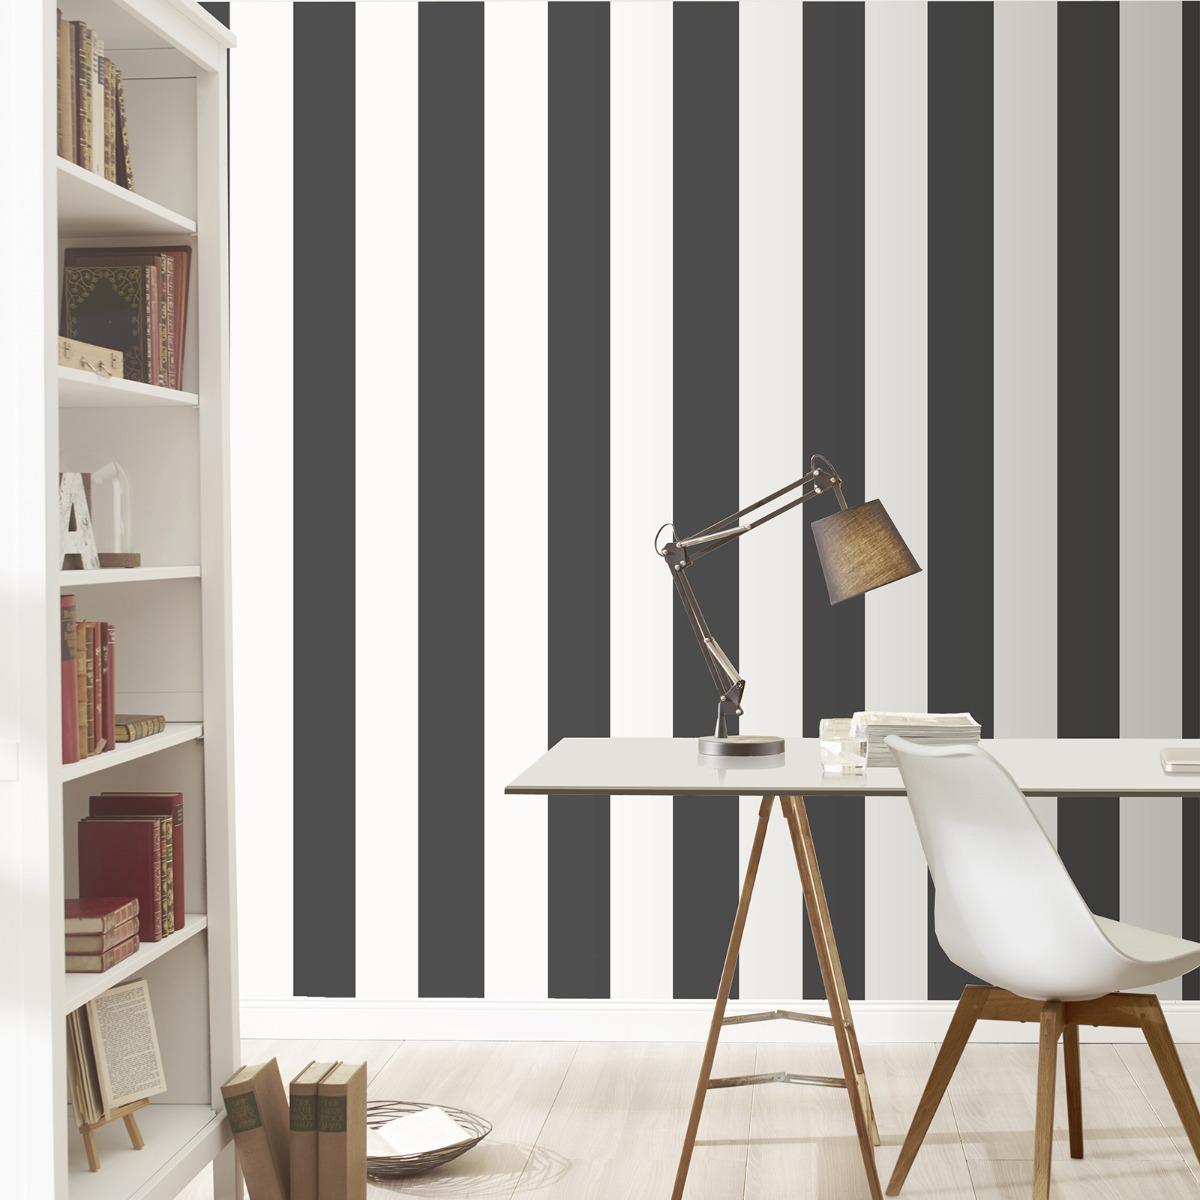 Stripe Wallpaper Black and White Rasch 286694